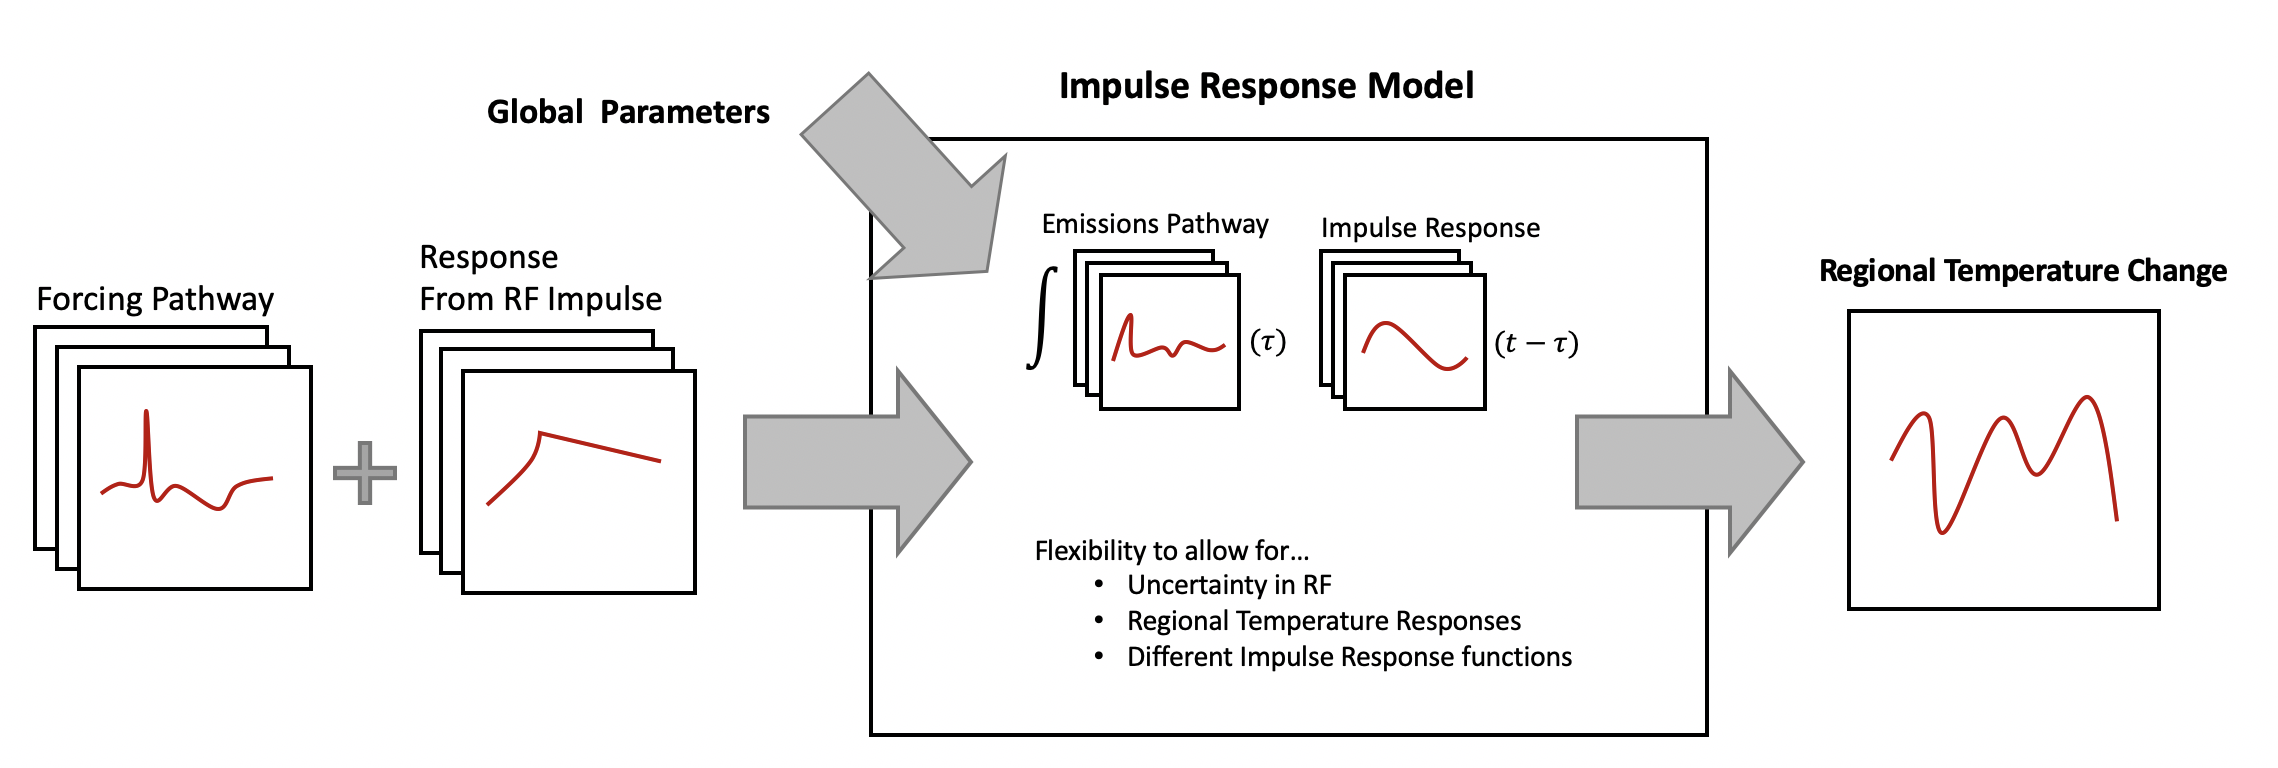 Conceptual Diagram of HIRM